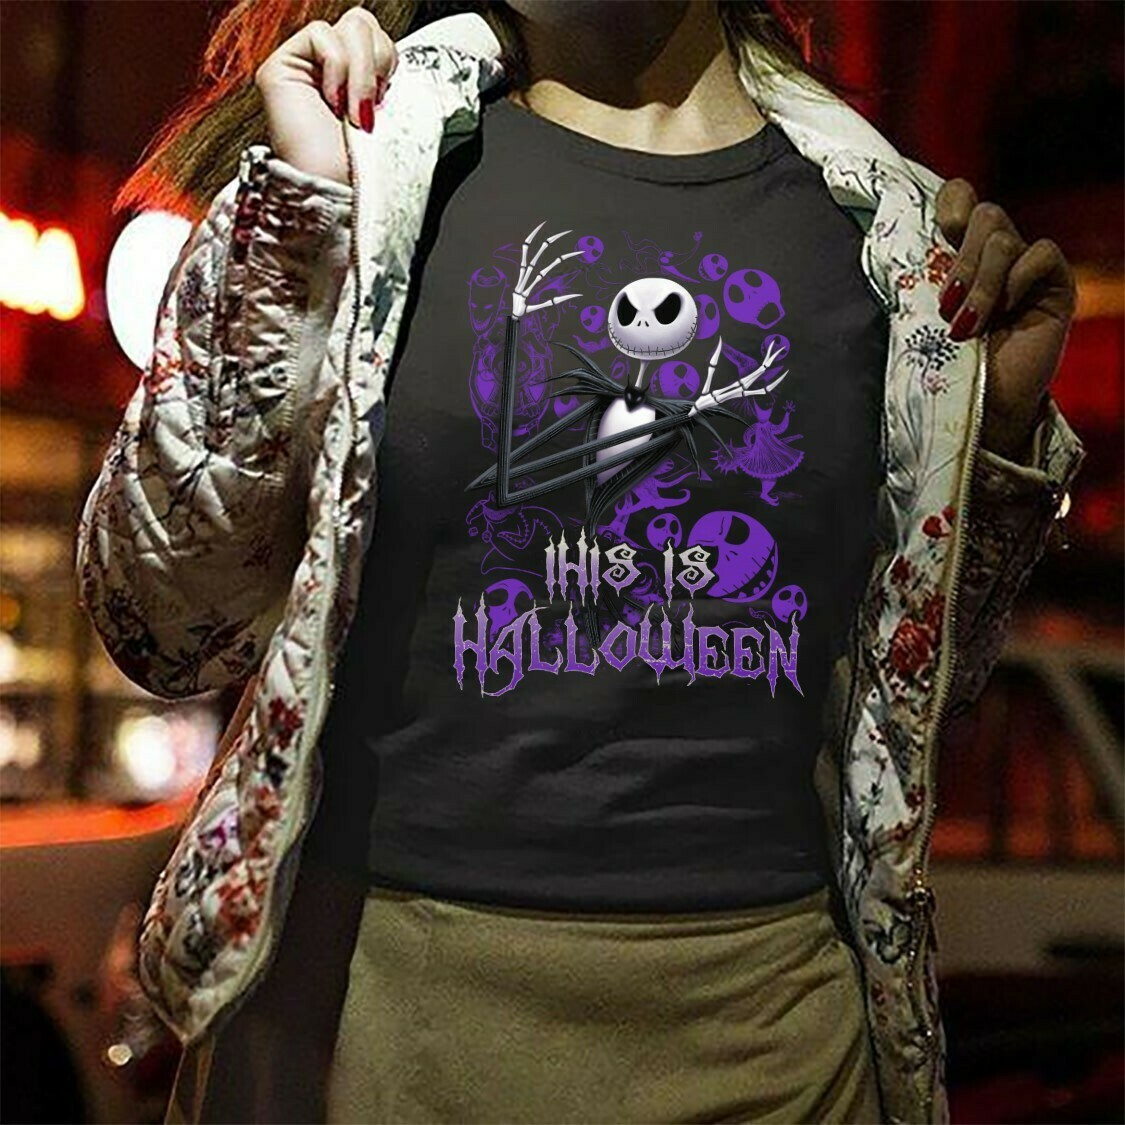 This Is Halloween - Jack Skellington The Nightmare Before Christmas Halloween, Disney Villains Halloween Mickey Not So Scary T Shirt Long Sleeve Sweatshirt Hoodie Jolly Family Gifts